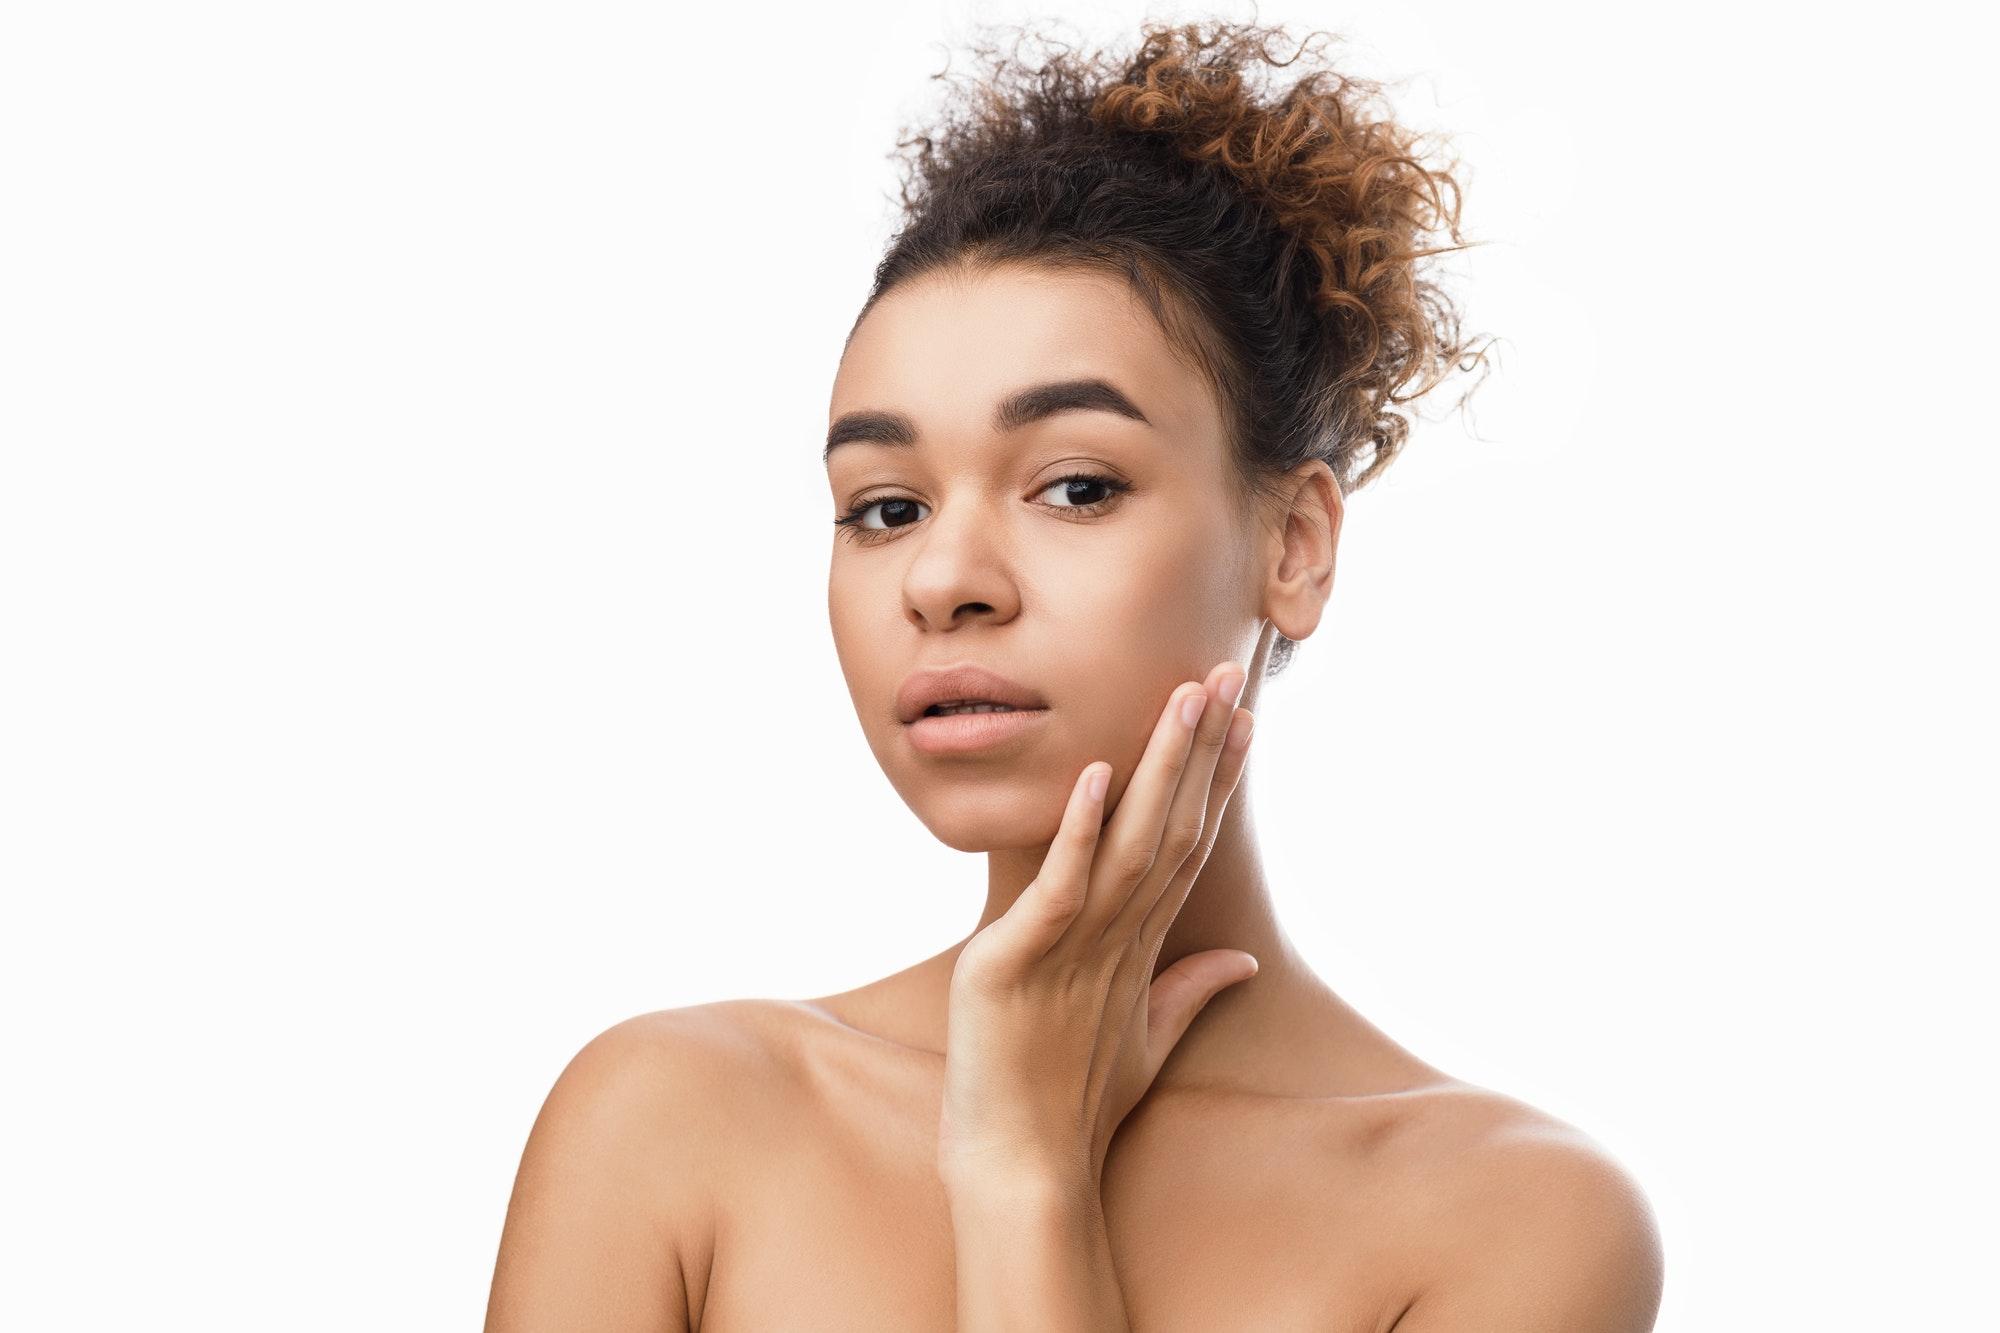 Facial treatment. Beautiful woman with clean fresh skin